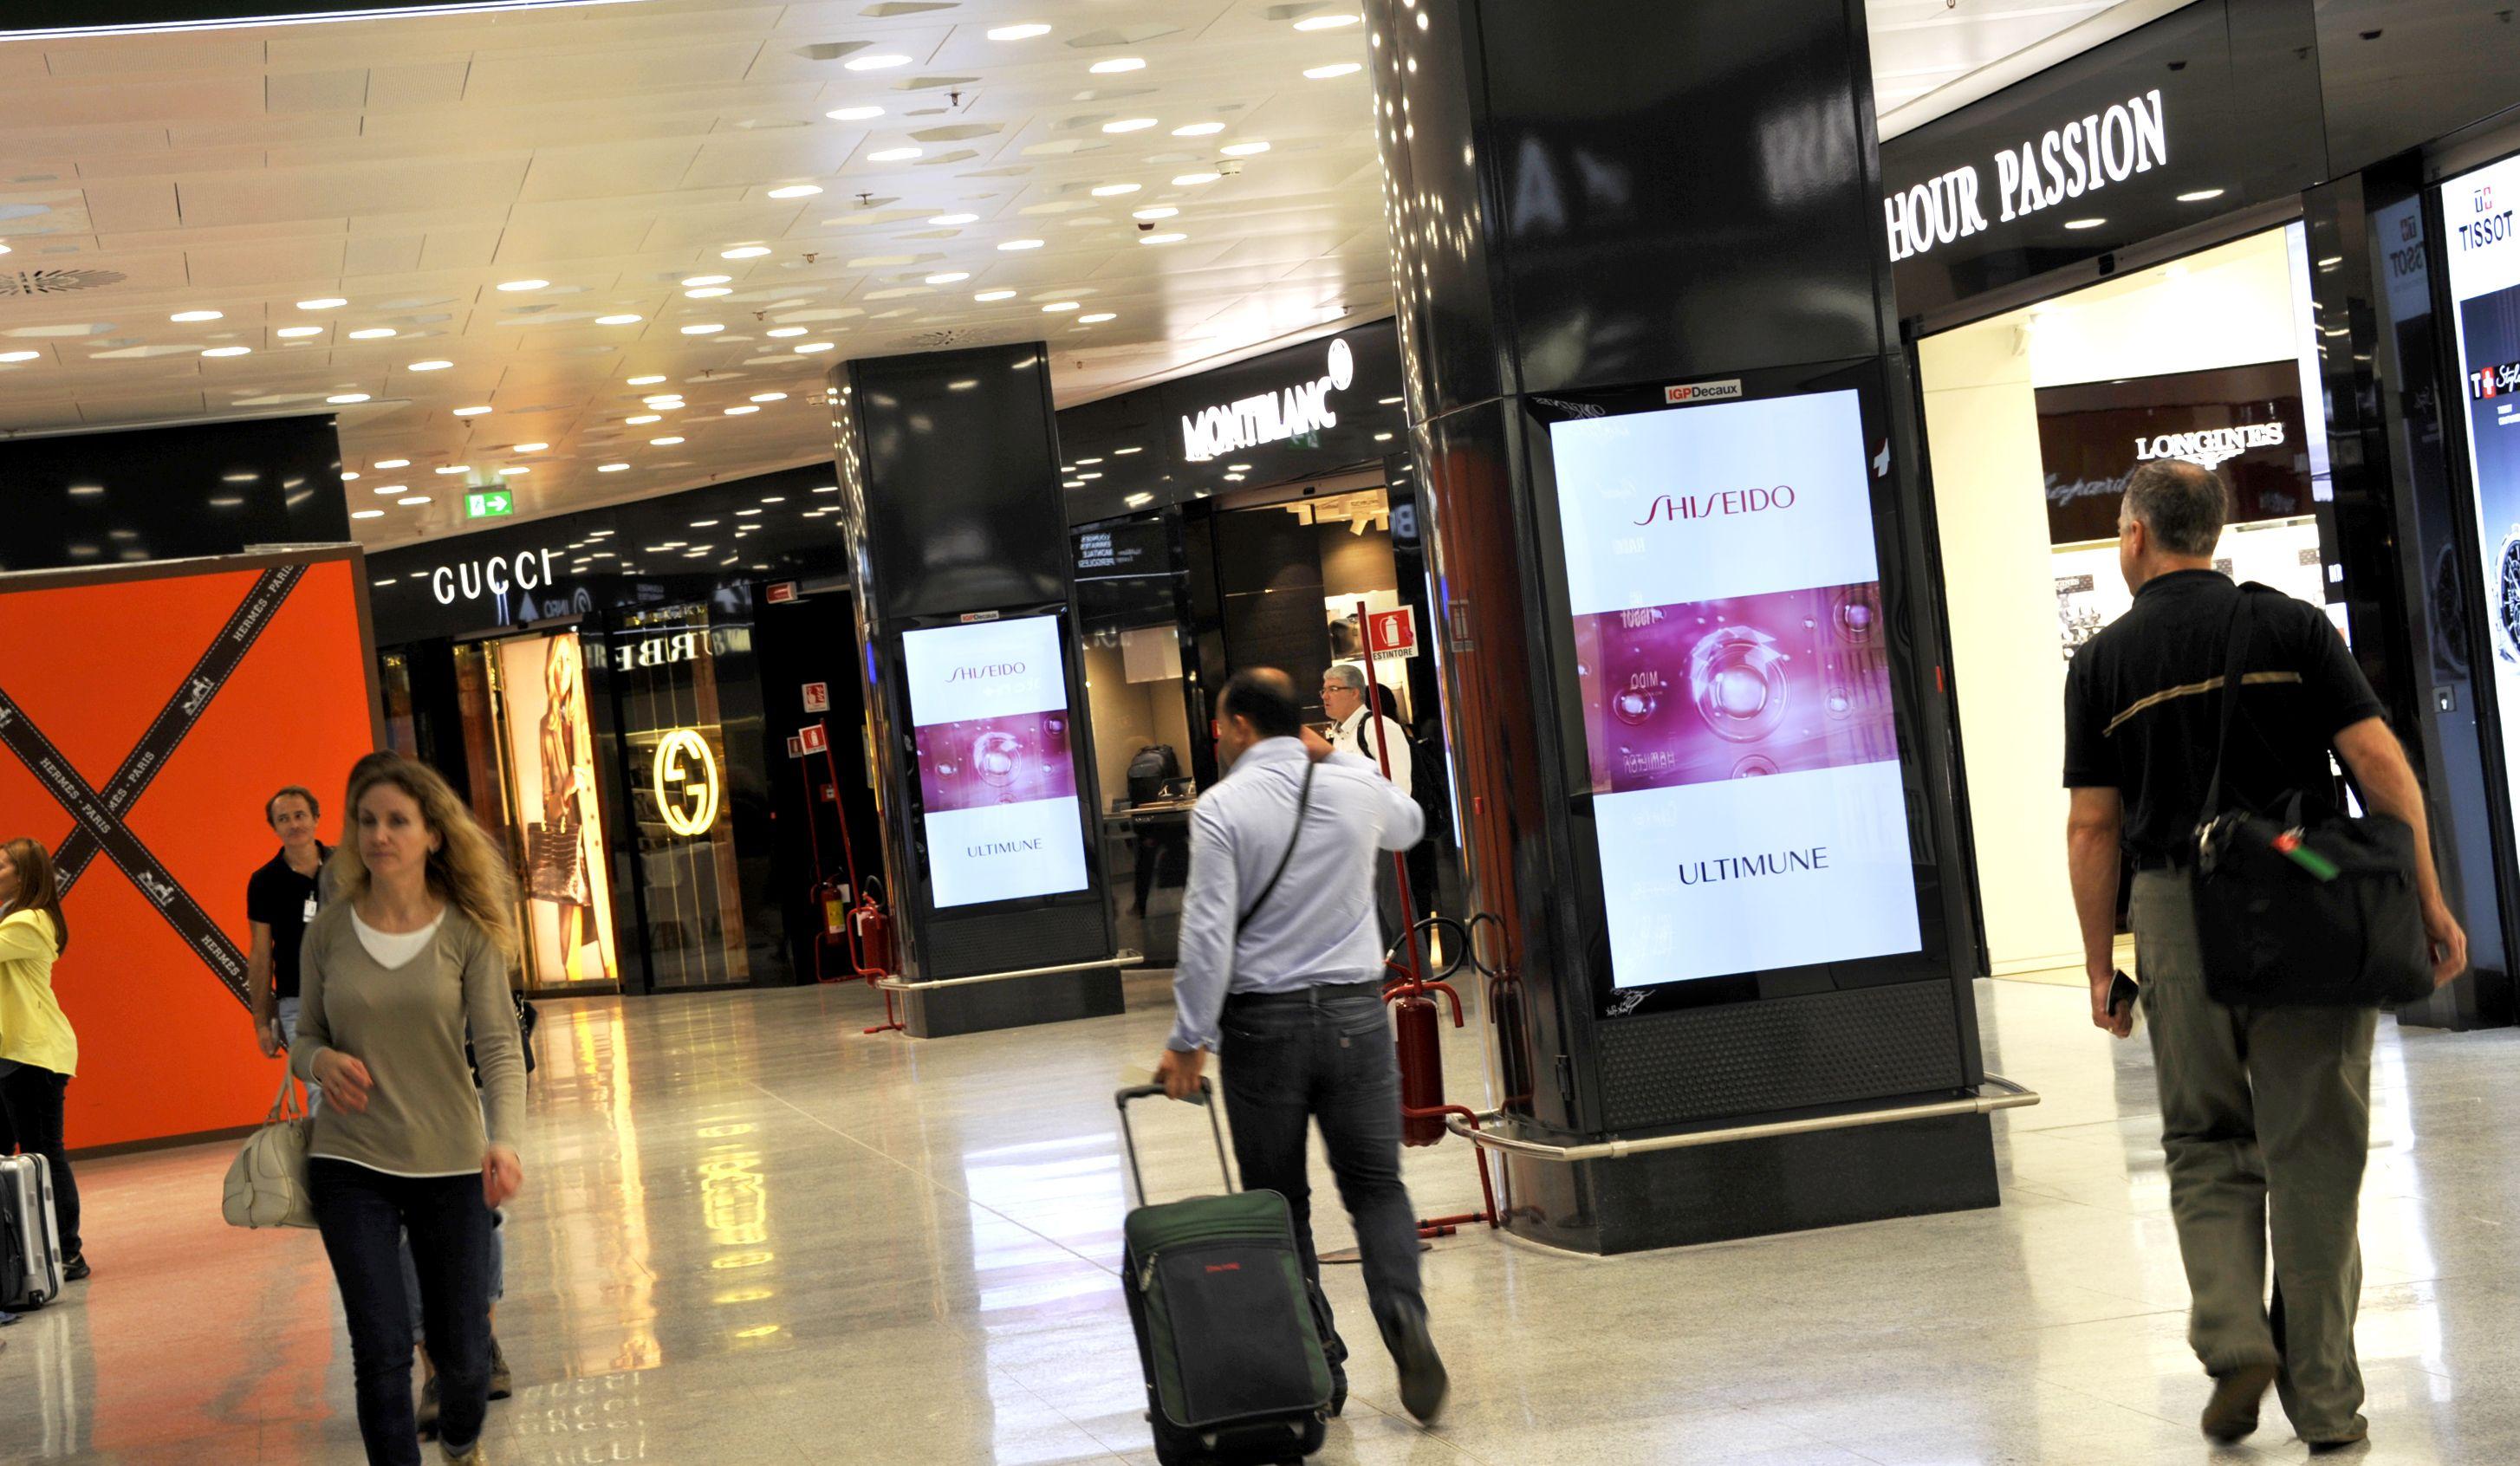 Aeroporti - Shiseido - Milano Malpensa #IGPDecaux #Shiseido #Milano #Malpensa